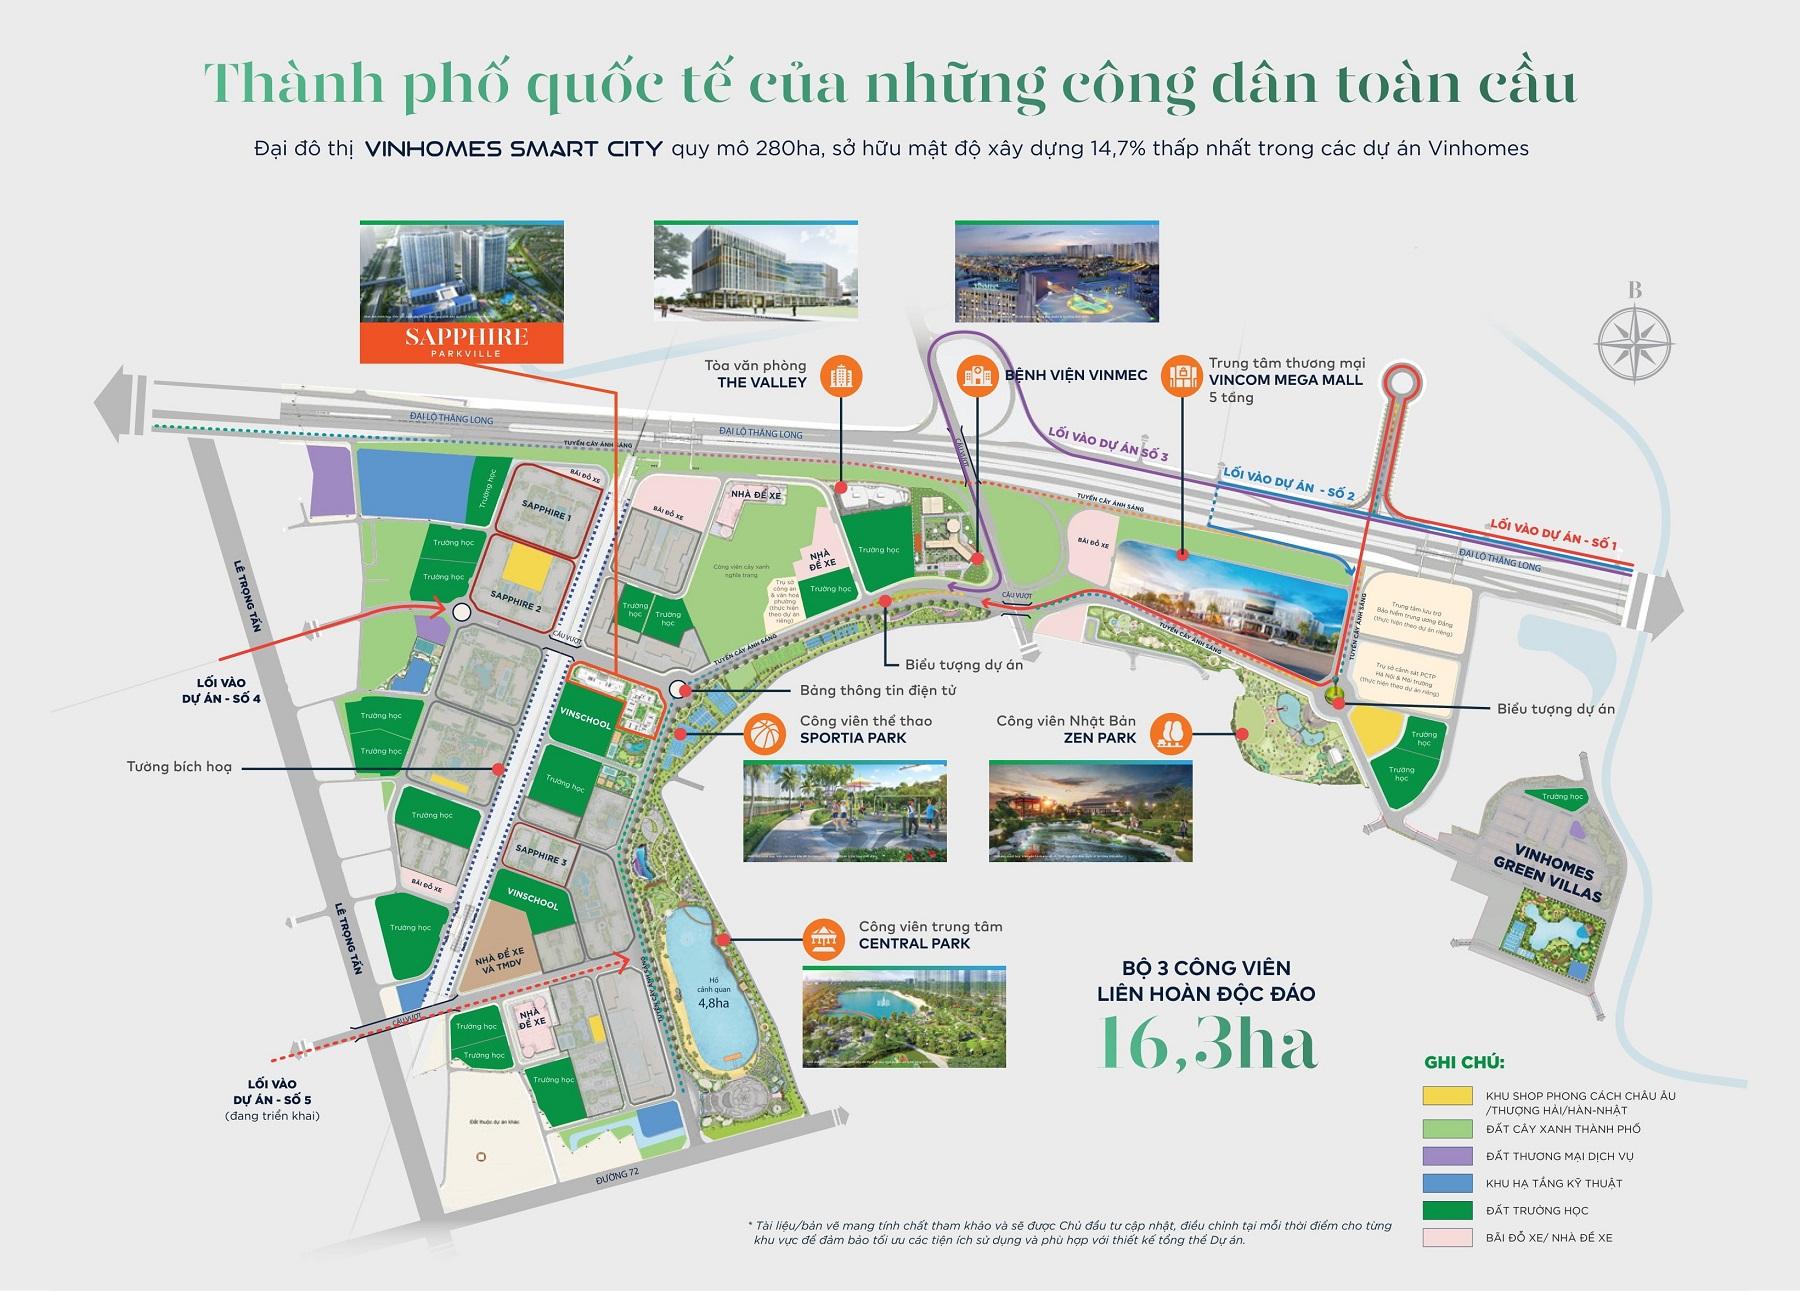 hinh anh kham pha cong vien the thao Vinhomes Smart City so 1